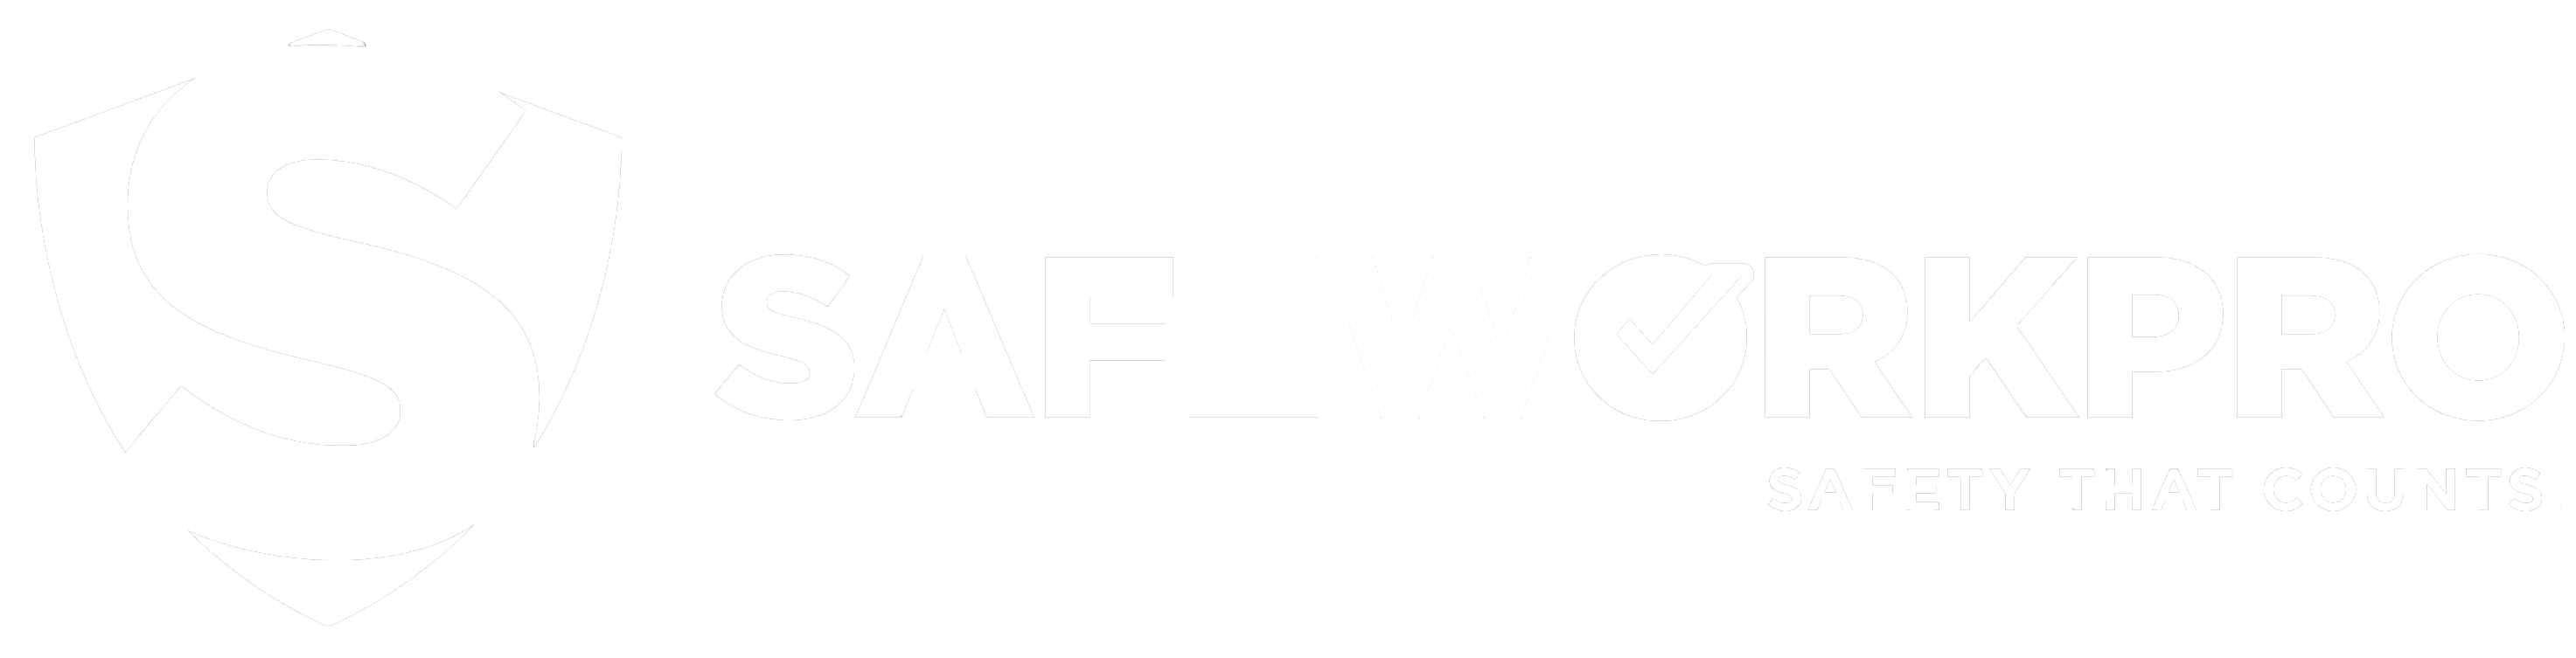 Safework Pro